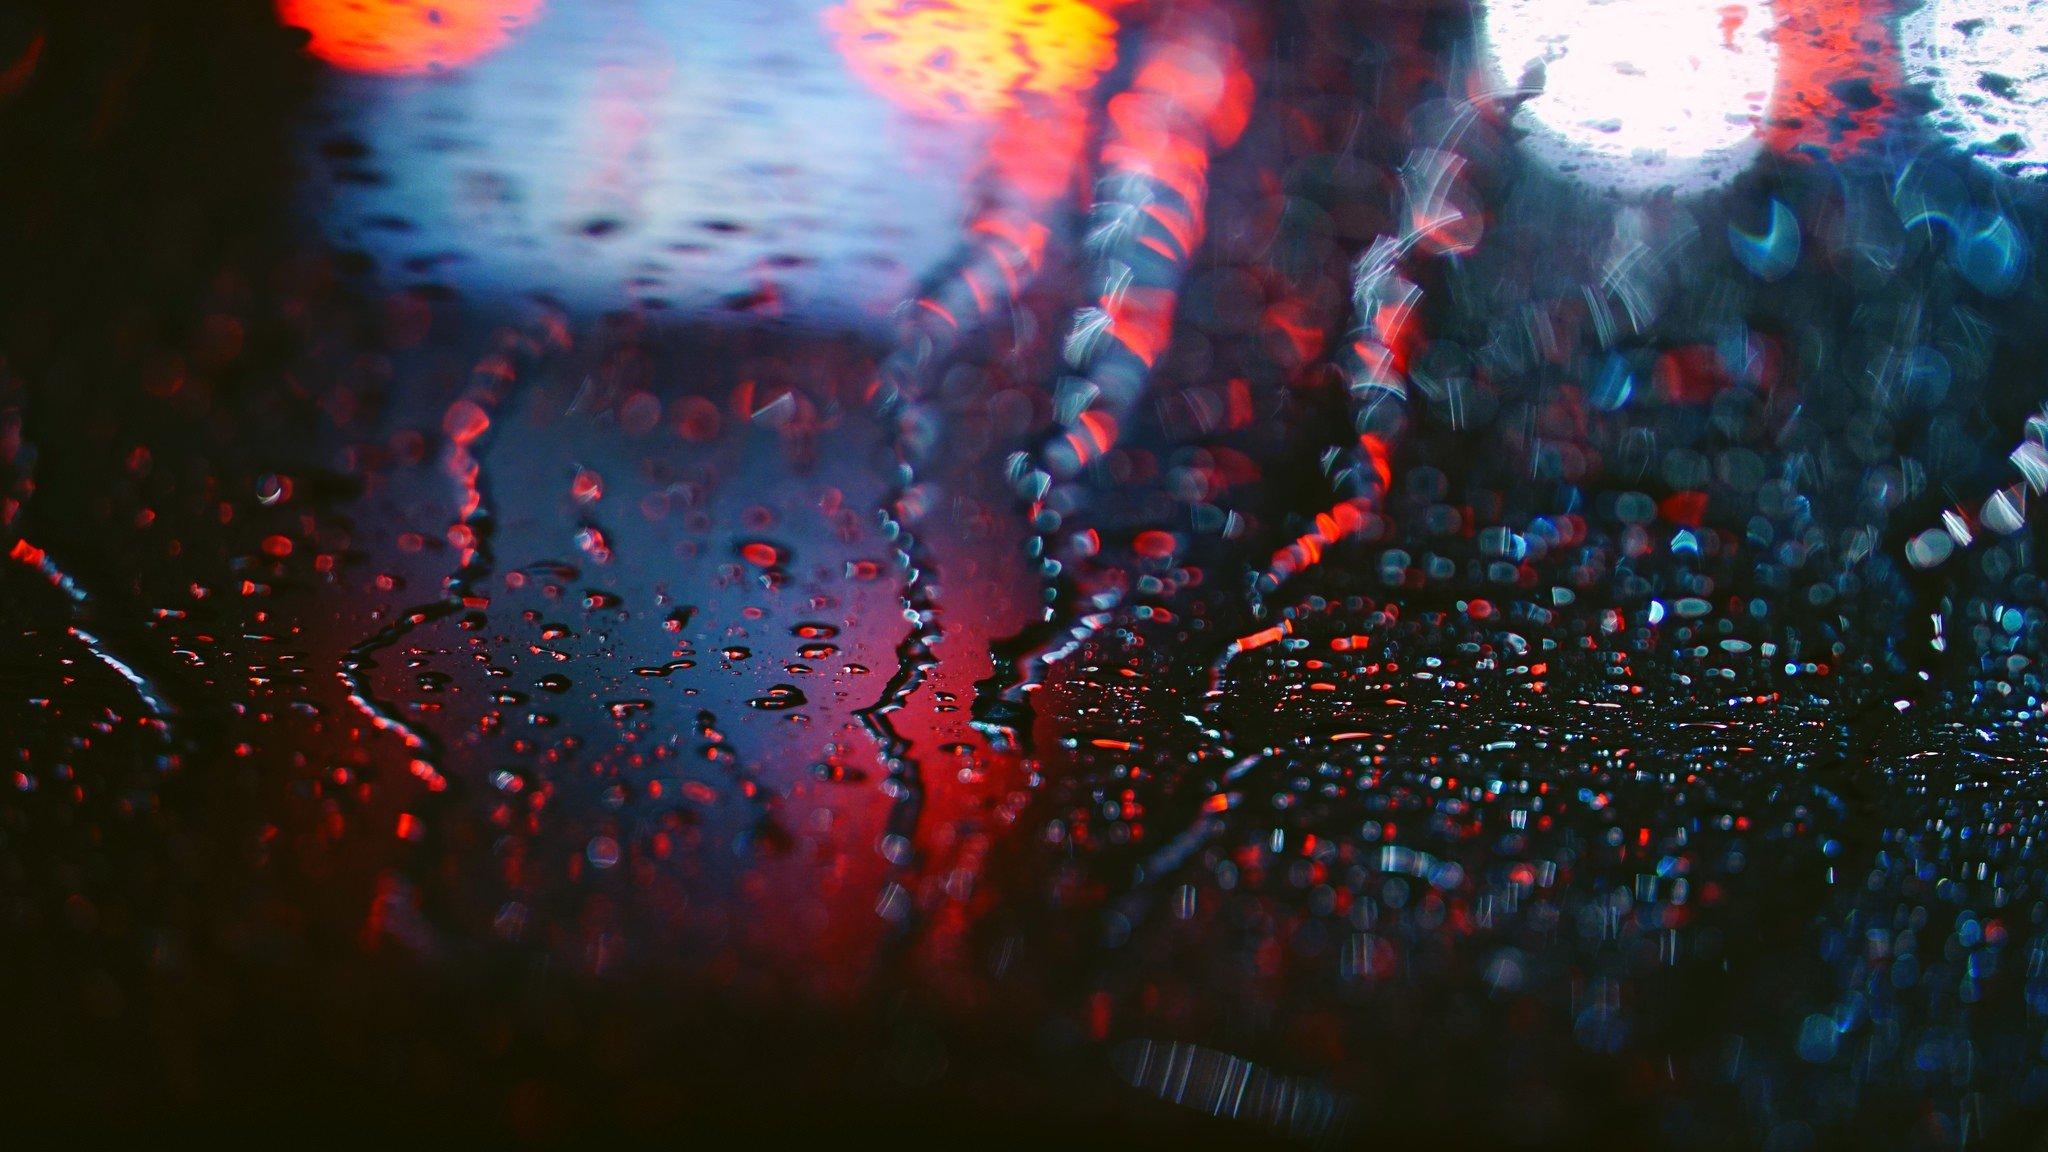 обои 2048x1152 Px боке глубина резкости макрос дождь